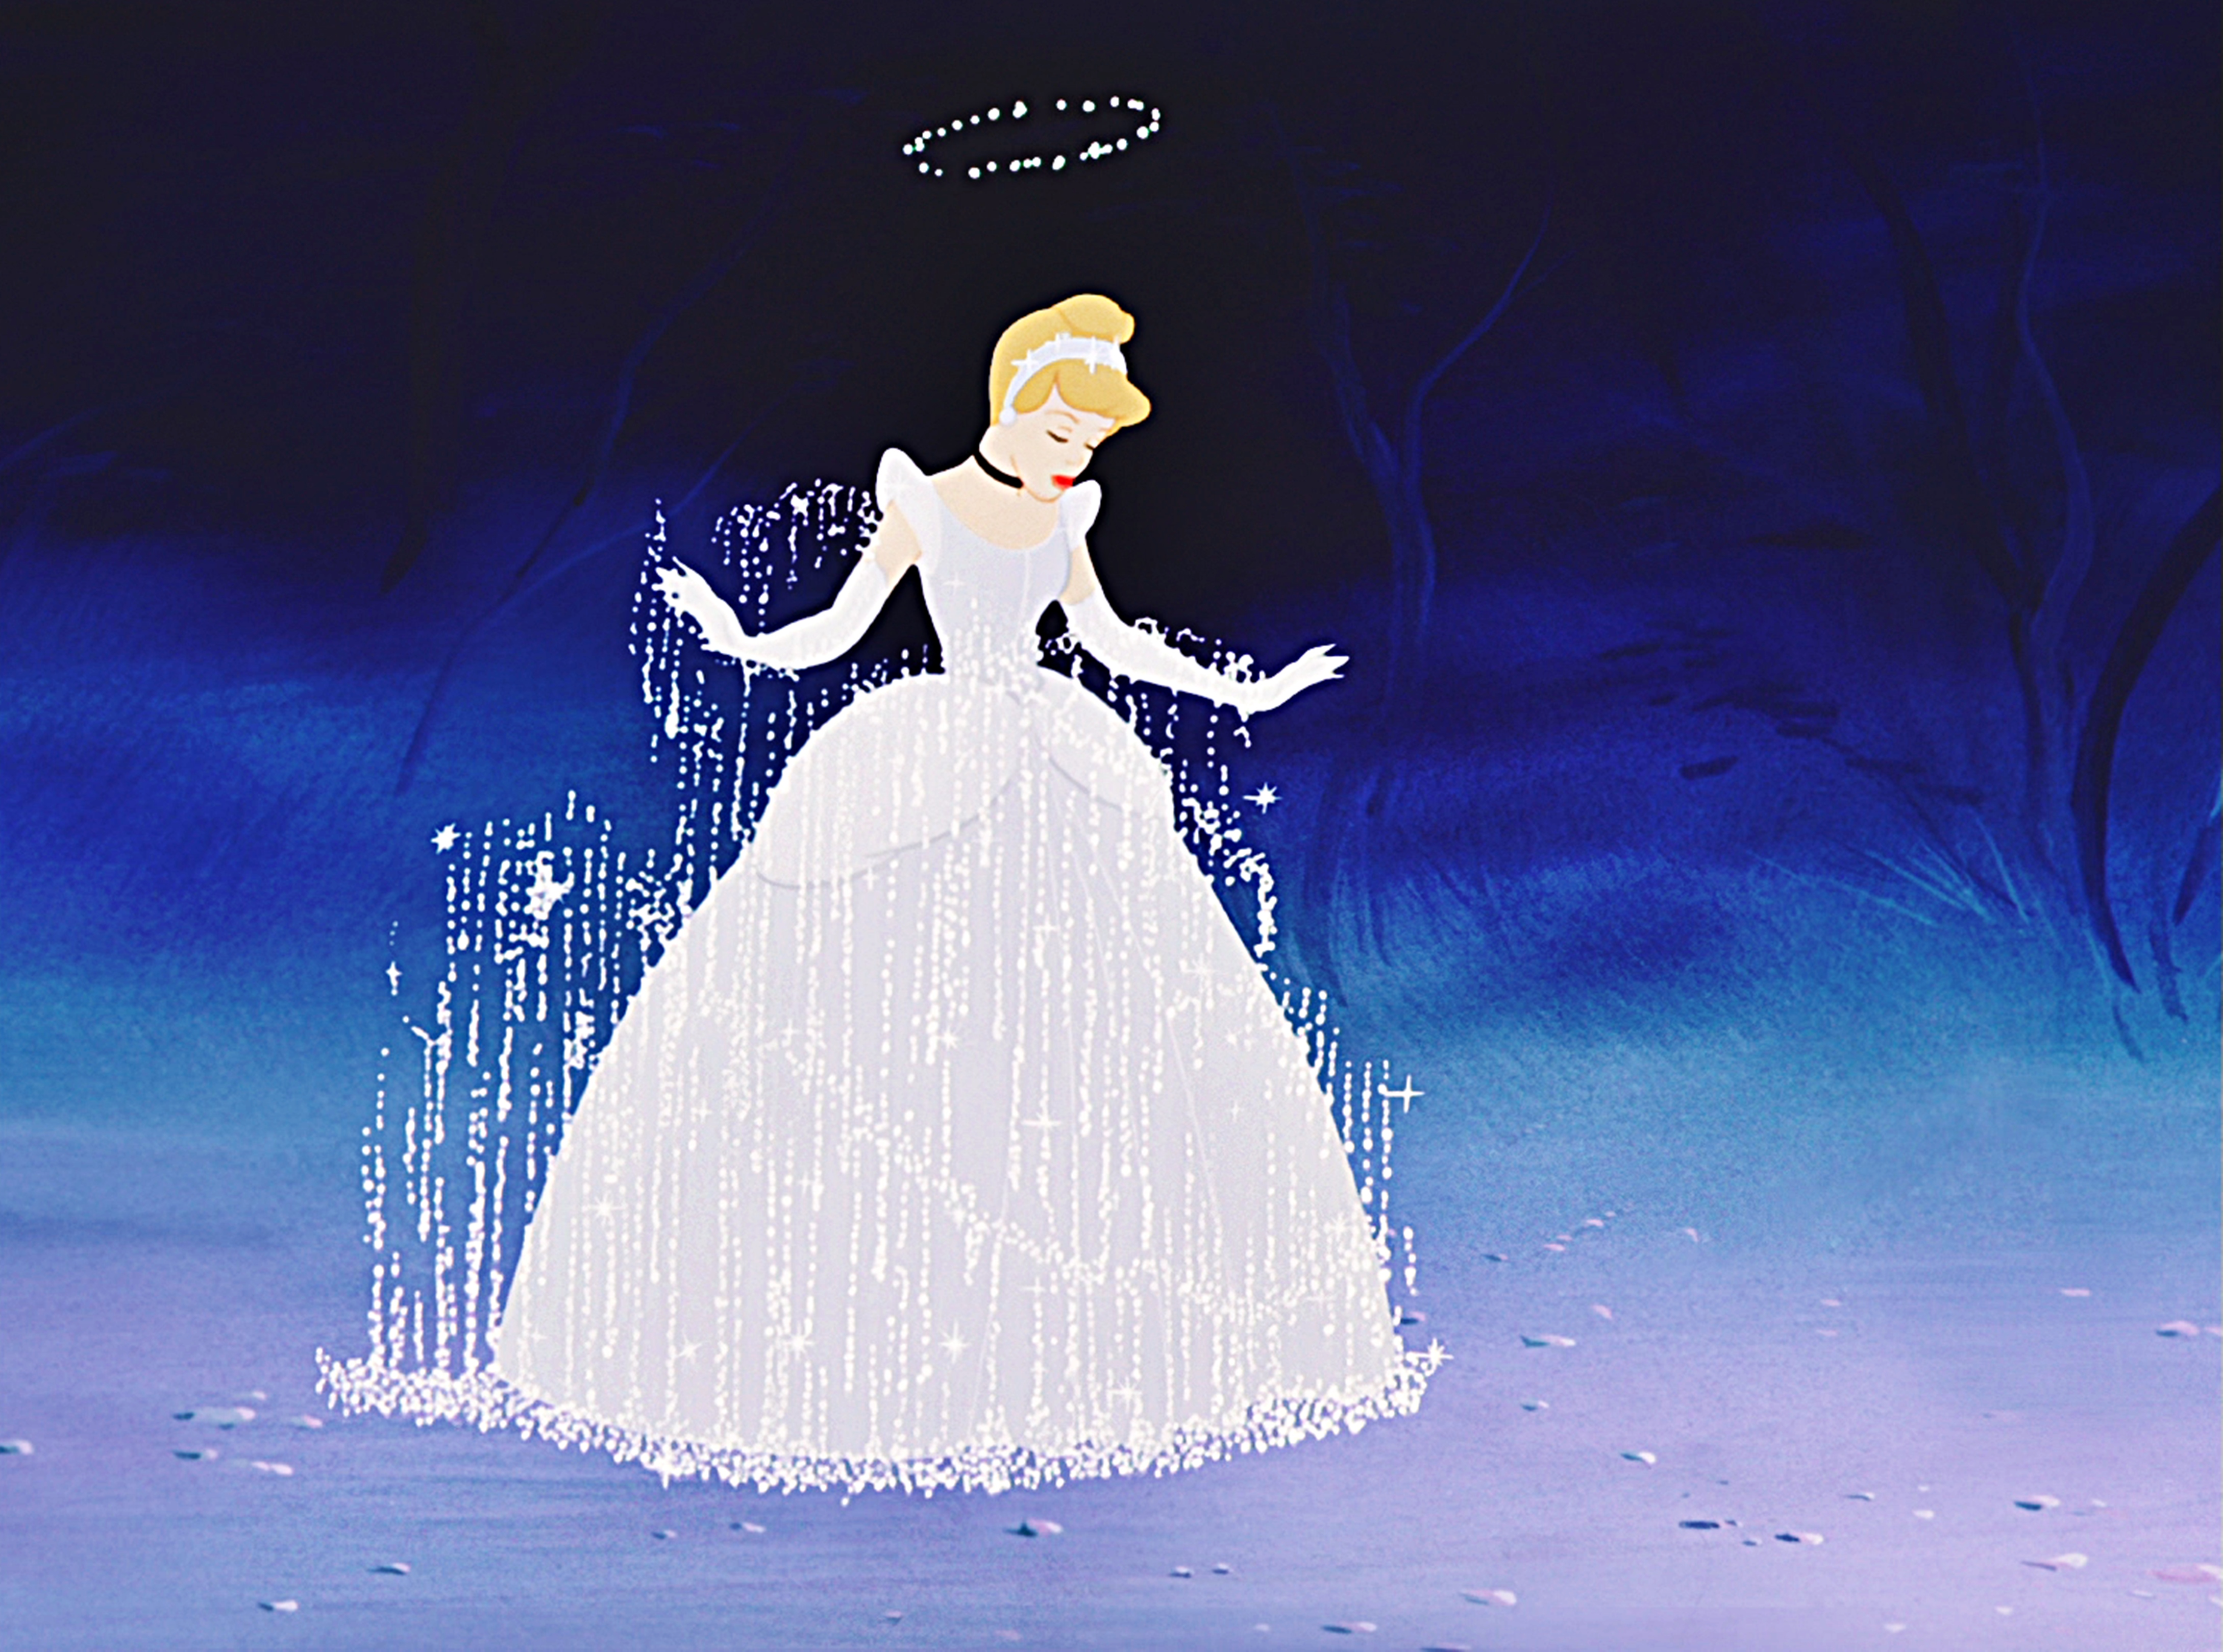 http://images6.fanpop.com/image/photos/34500000/Walt-Disney-Screencaps-Princess-Cinderella-walt-disney-characters-34508618-4356-3237.jpg